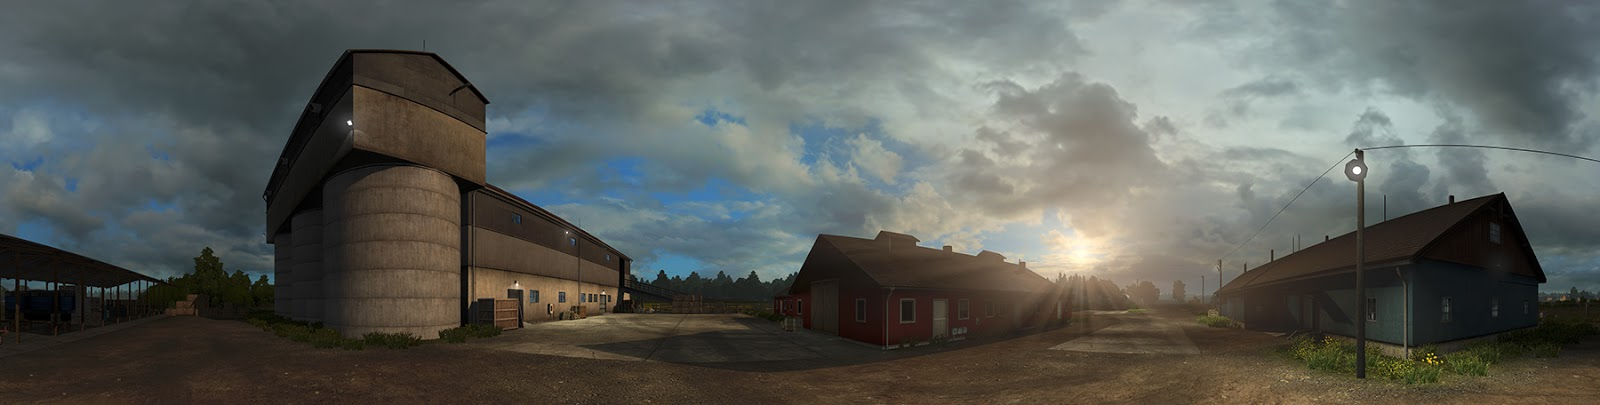 ets2_scandinavia_dlc_new_weather_003